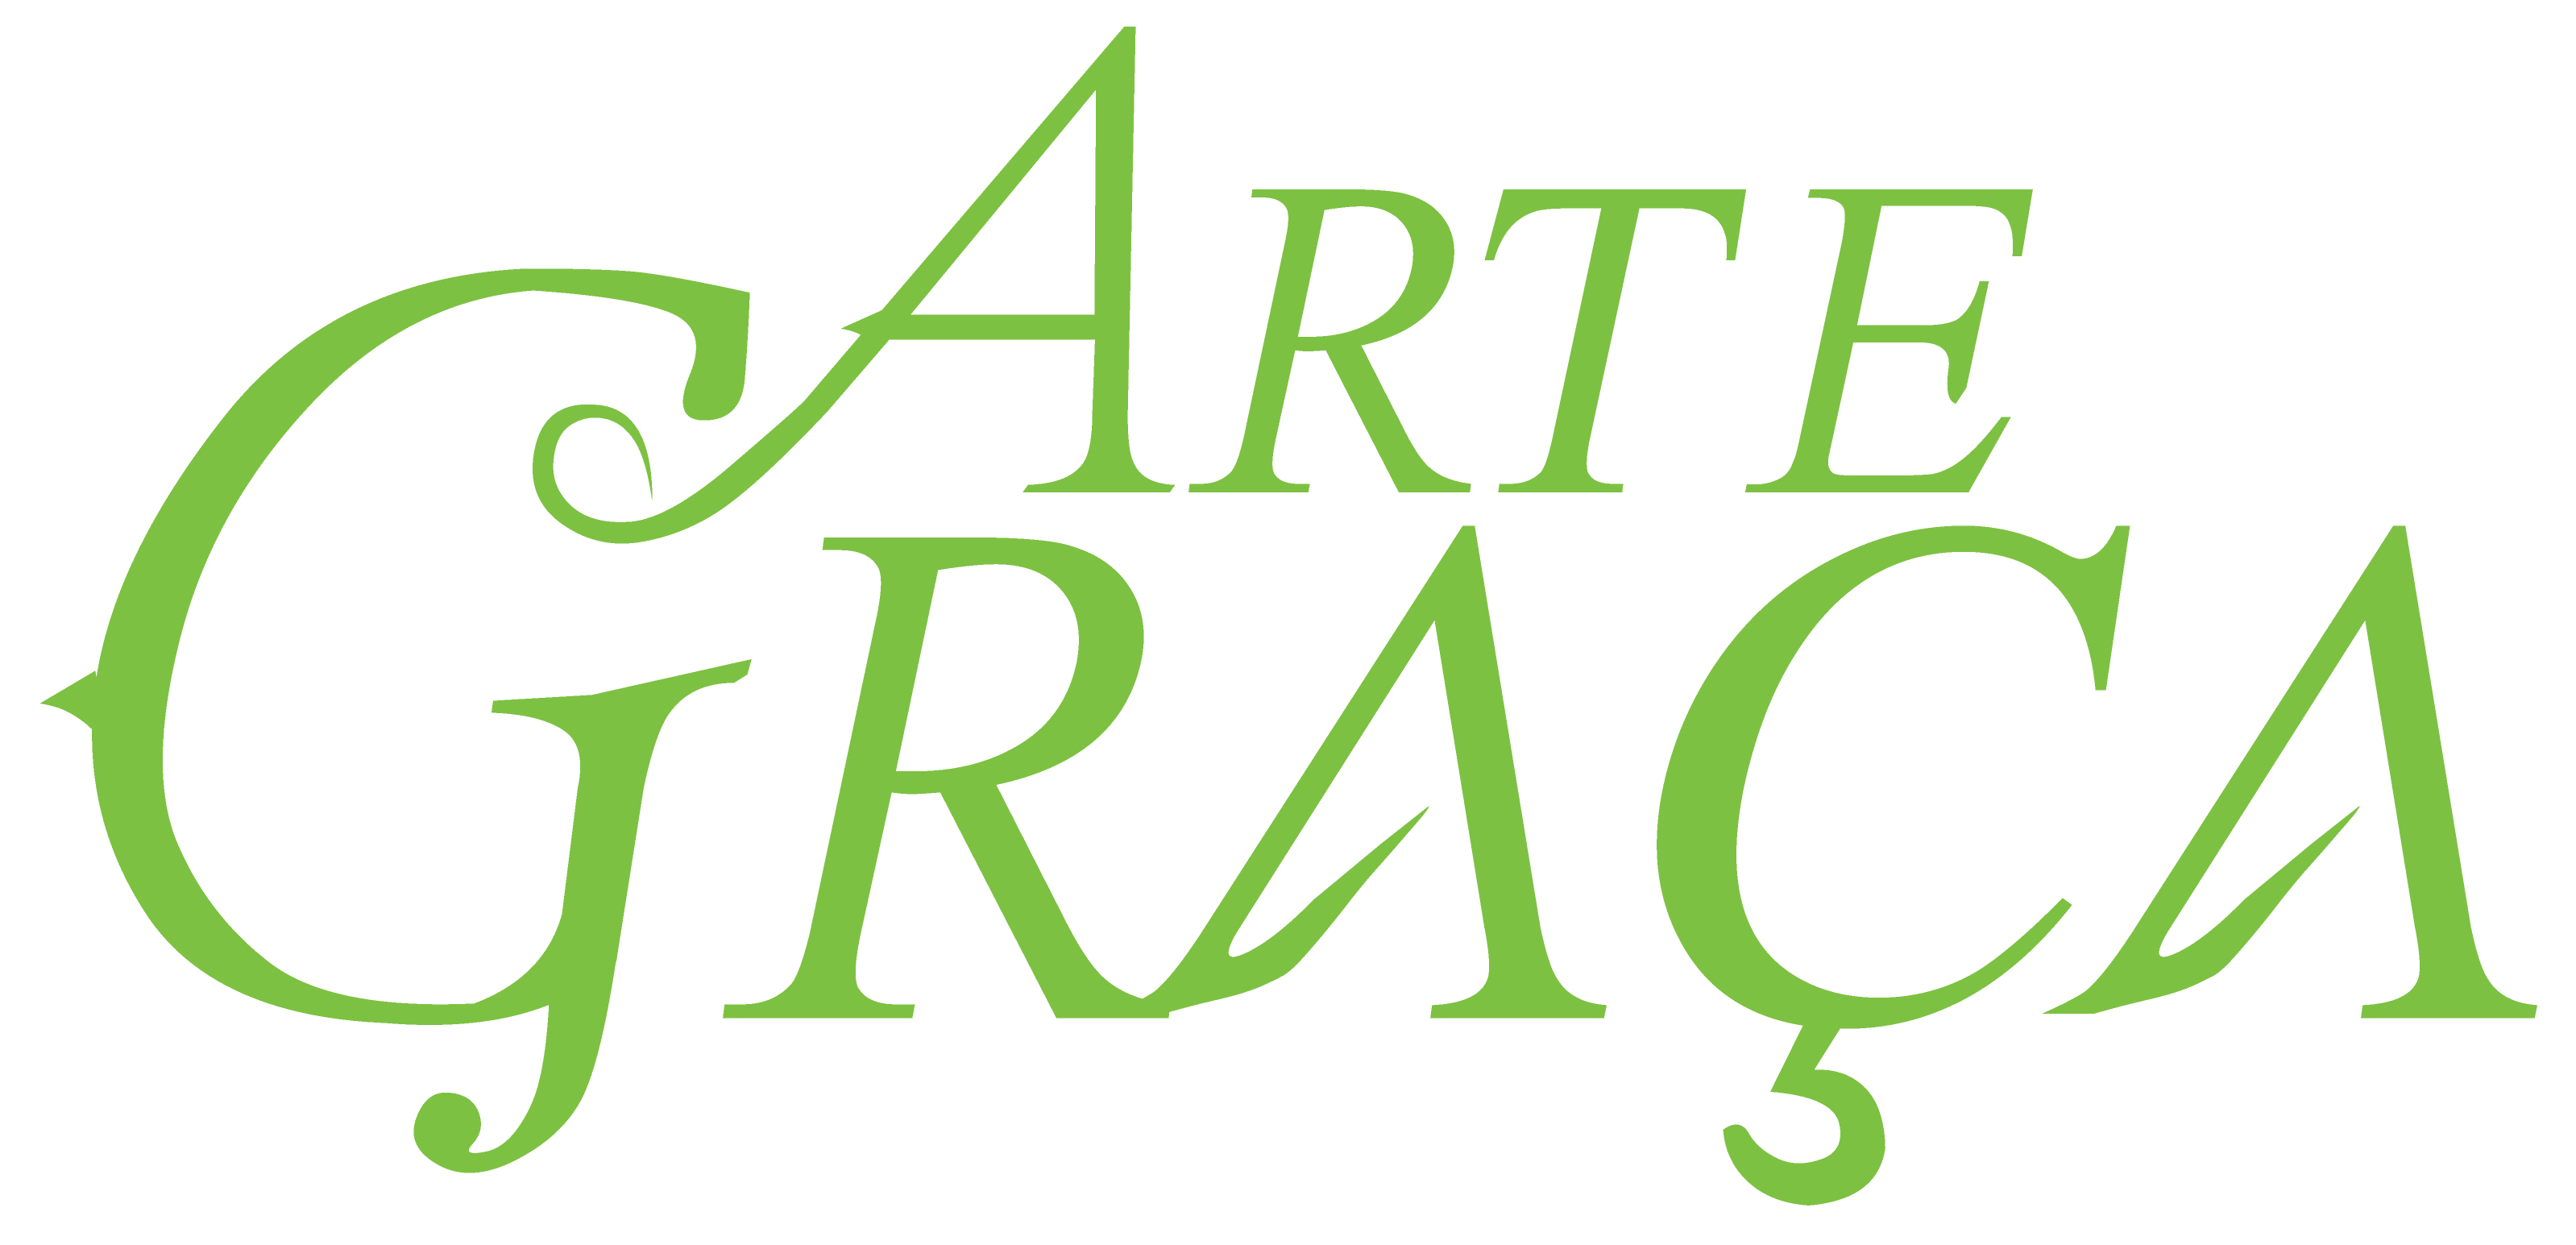 ArteGraça